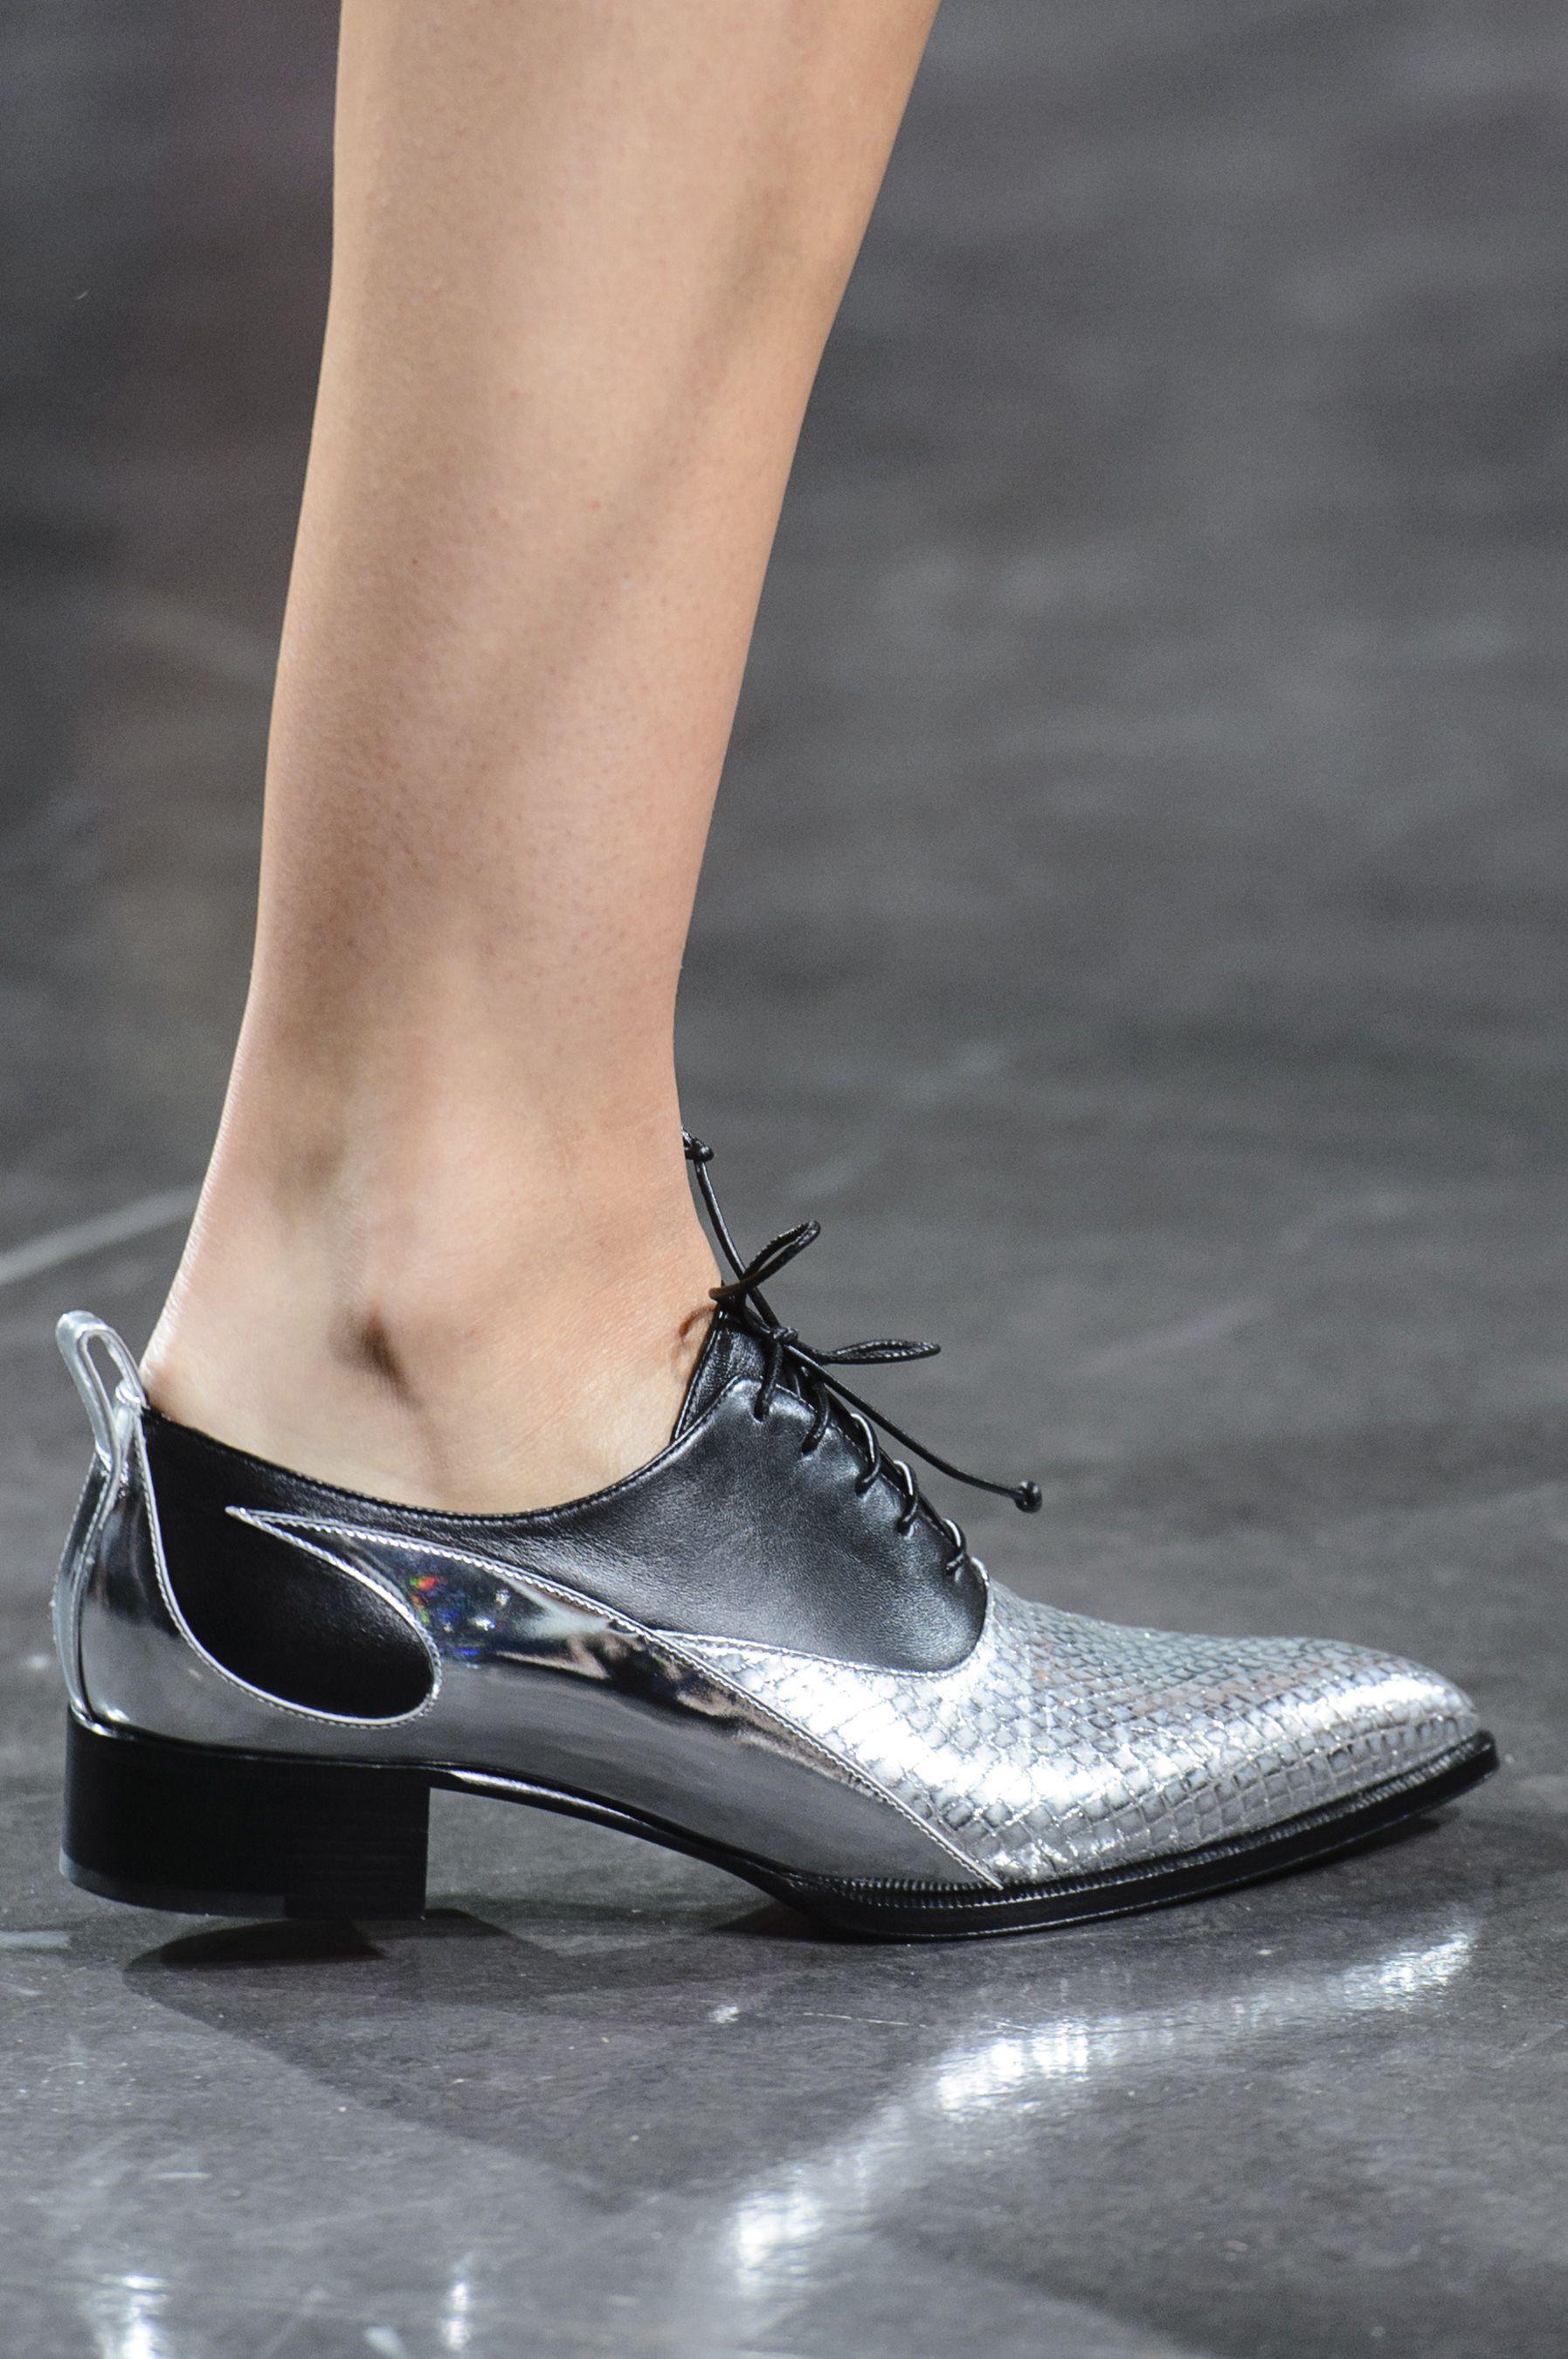 d3d84a4bf27ed Best Shoes of Paris Fashion Week Spring 2018